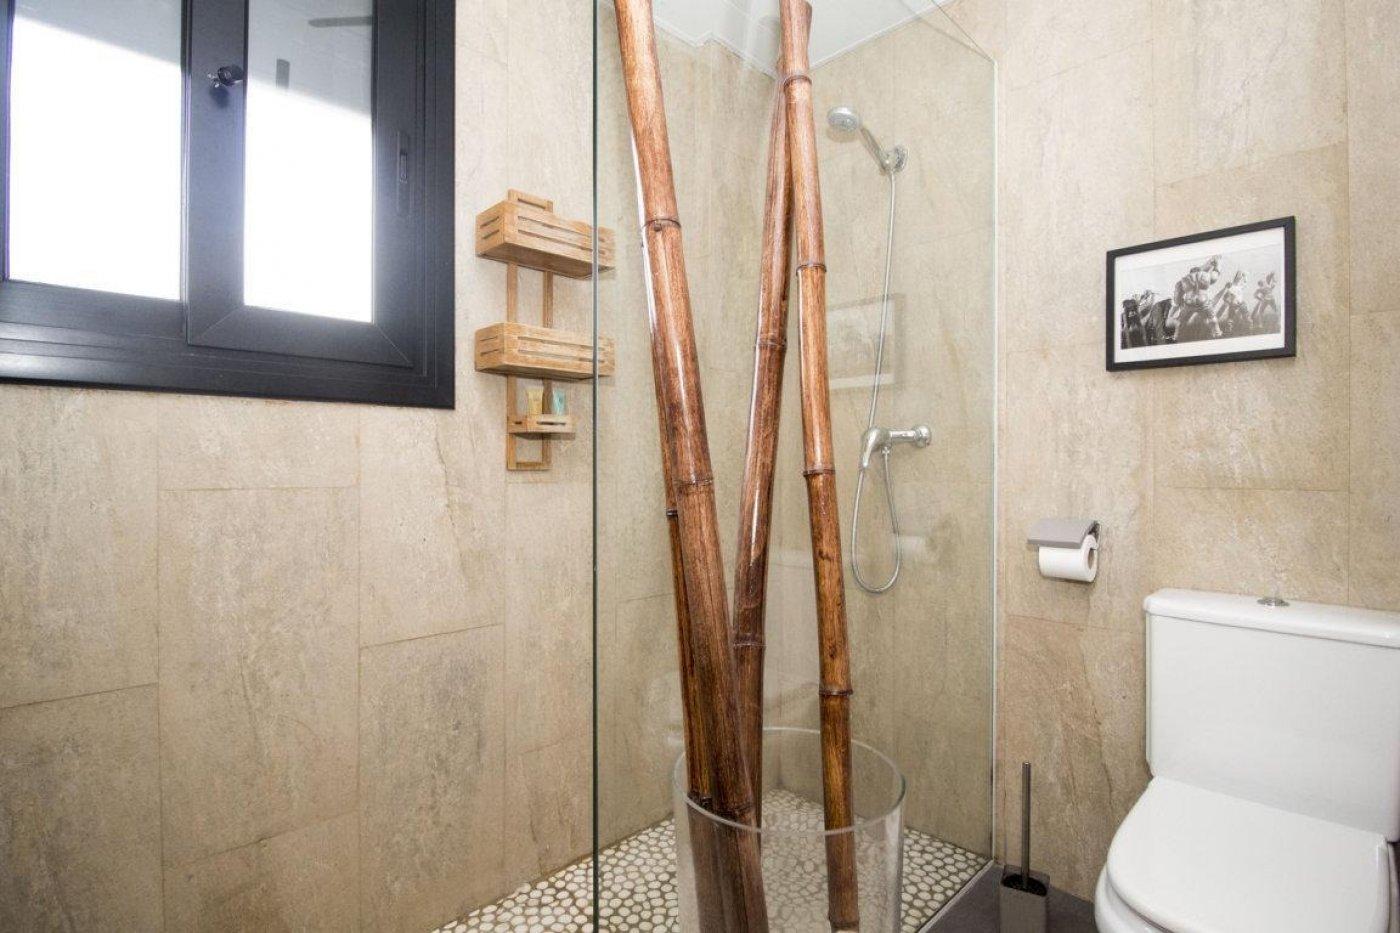 Casa exclusiva con piscina - imagenInmueble21